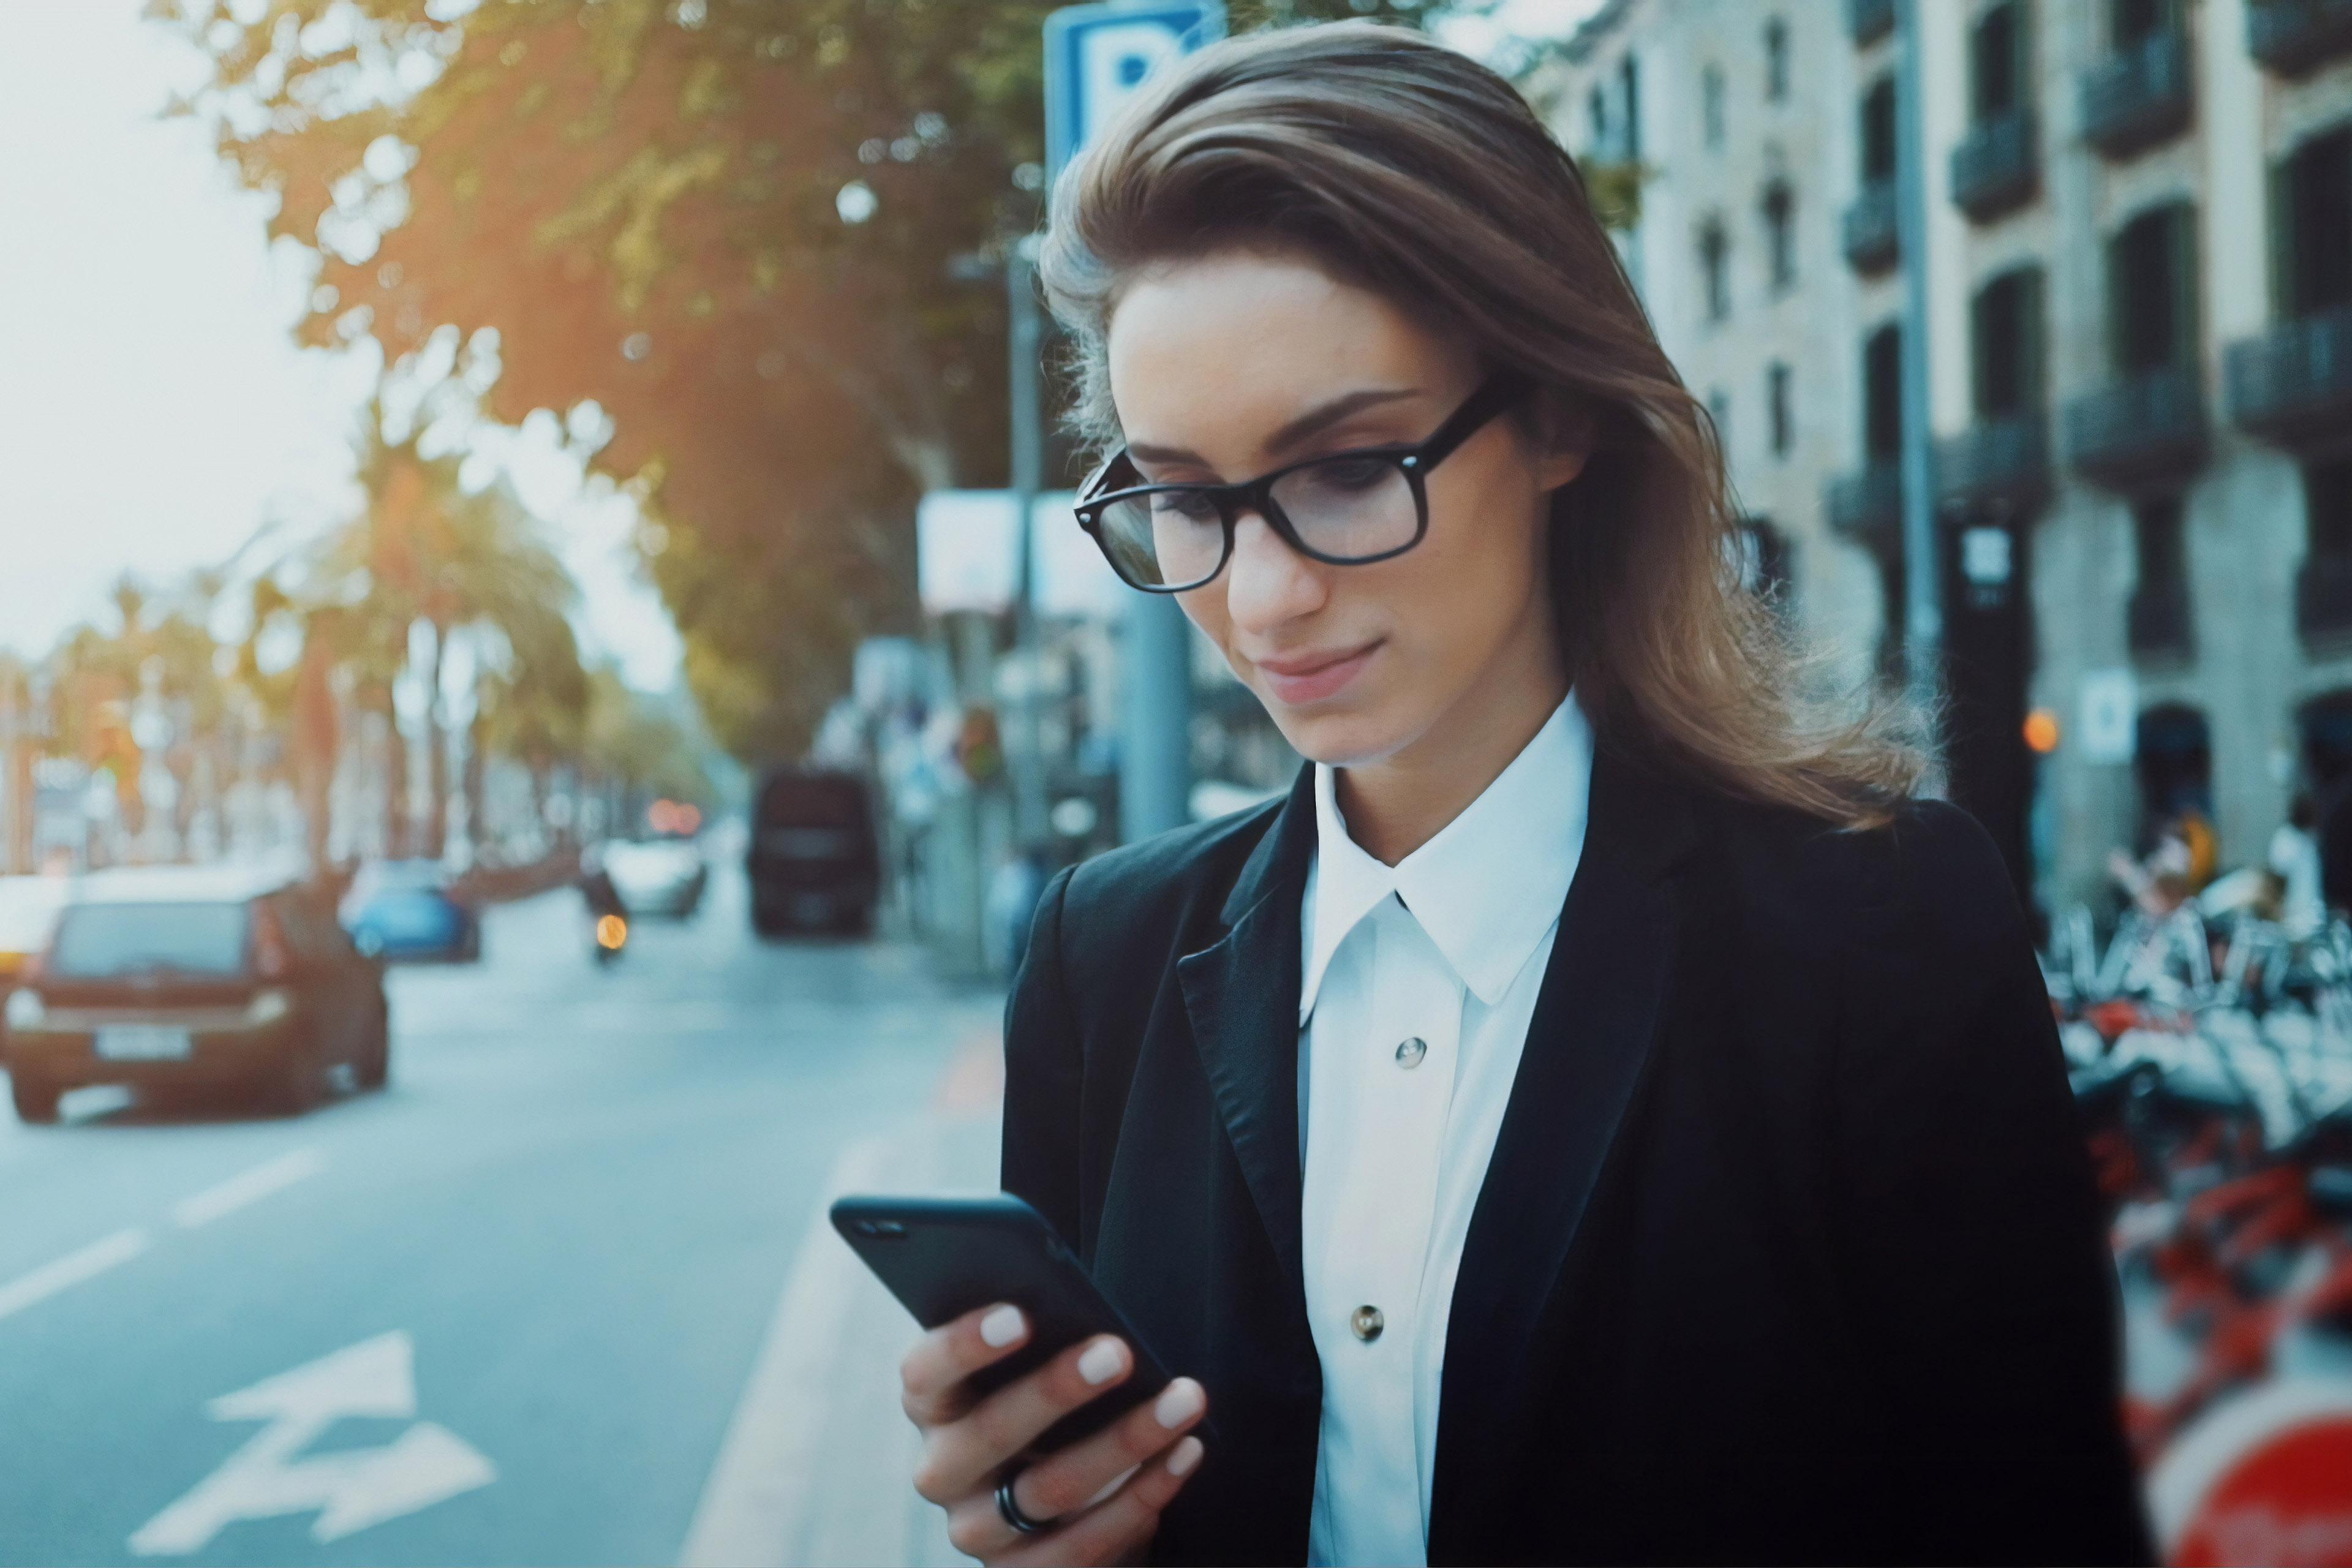 Female auditor using ey digital audit technology on mobile